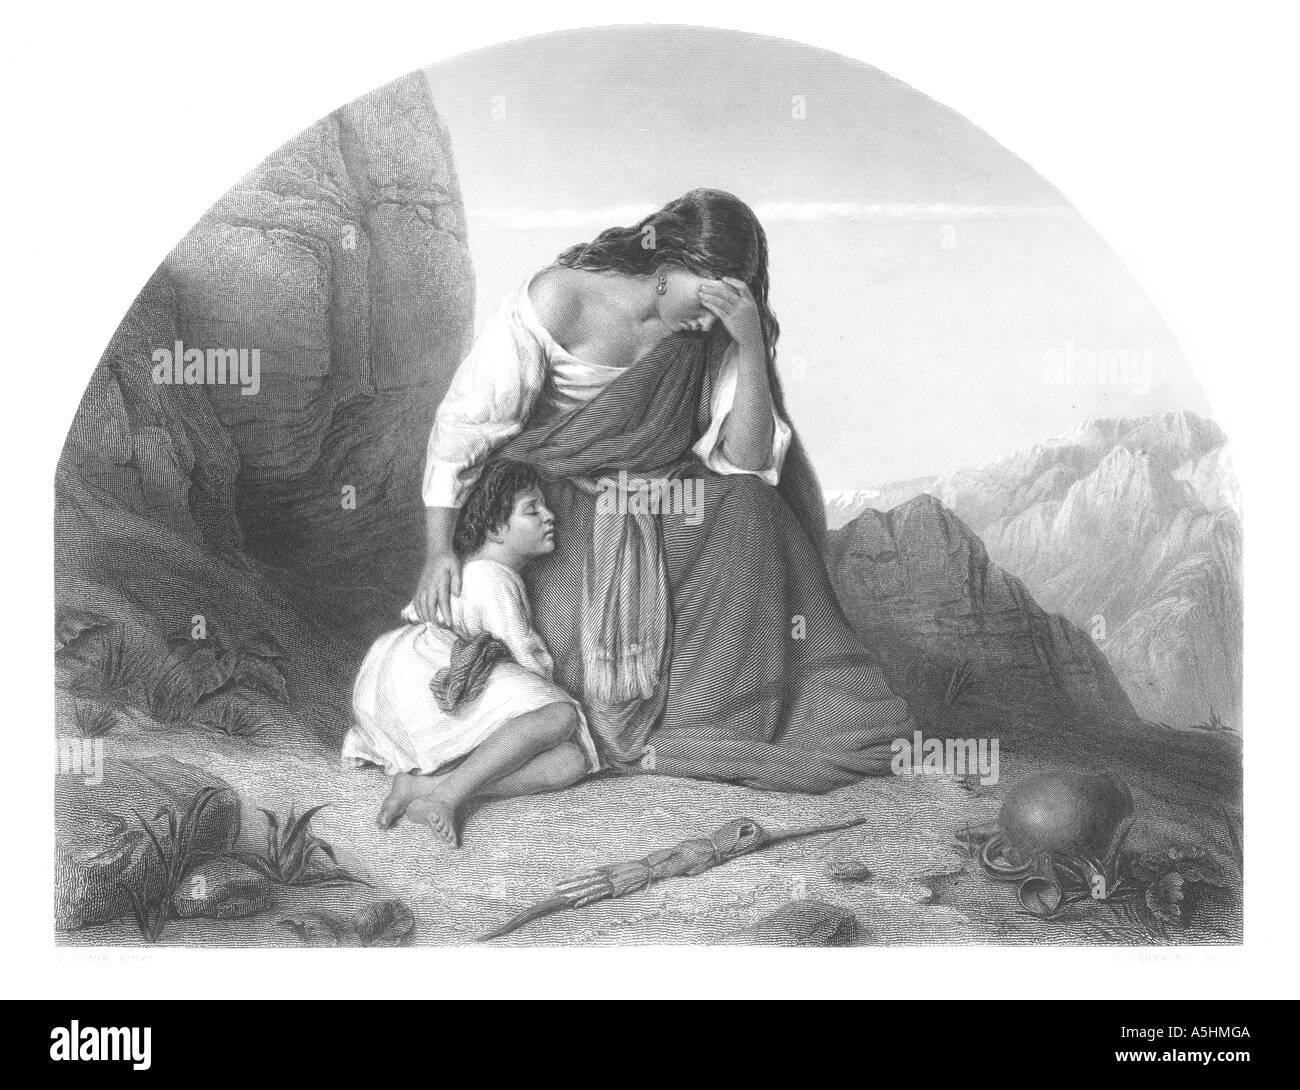 Hagar and Ishmael Genesis Chapter 21 Verse 16 engraving - Stock Image